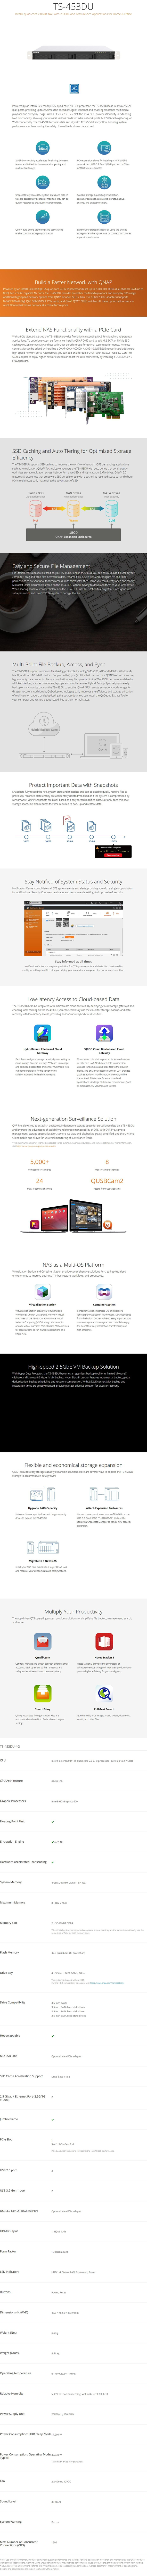 QNAP TS-453DU-4G 4 Bay Diskless NAS Intel Celeron Quad Core 2.0GHz CPU 4GB RAM - Overview 1